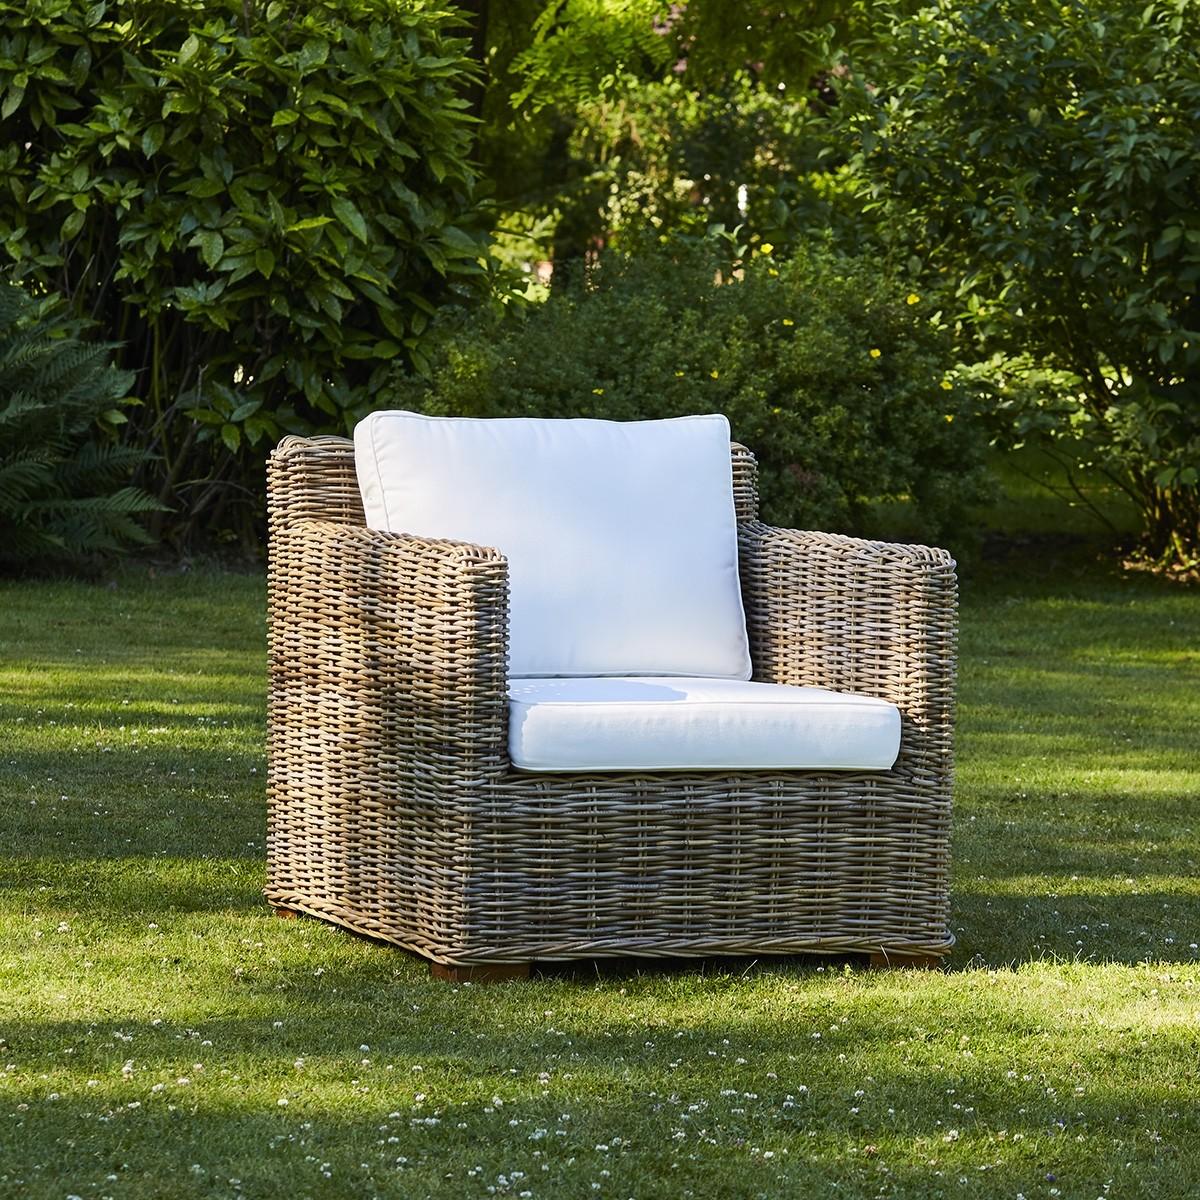 fauteuil en kubu naturel bois dessus bois dessous. Black Bedroom Furniture Sets. Home Design Ideas